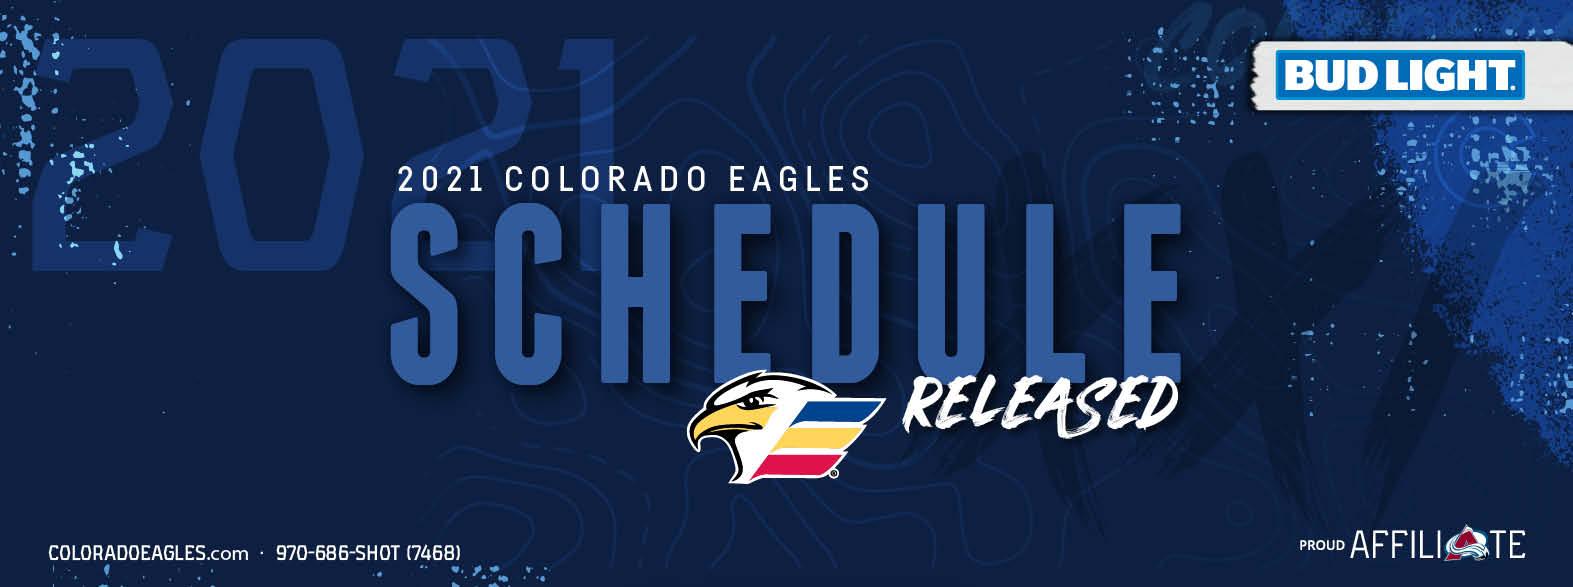 Eagles Announce Regular Season Schedule